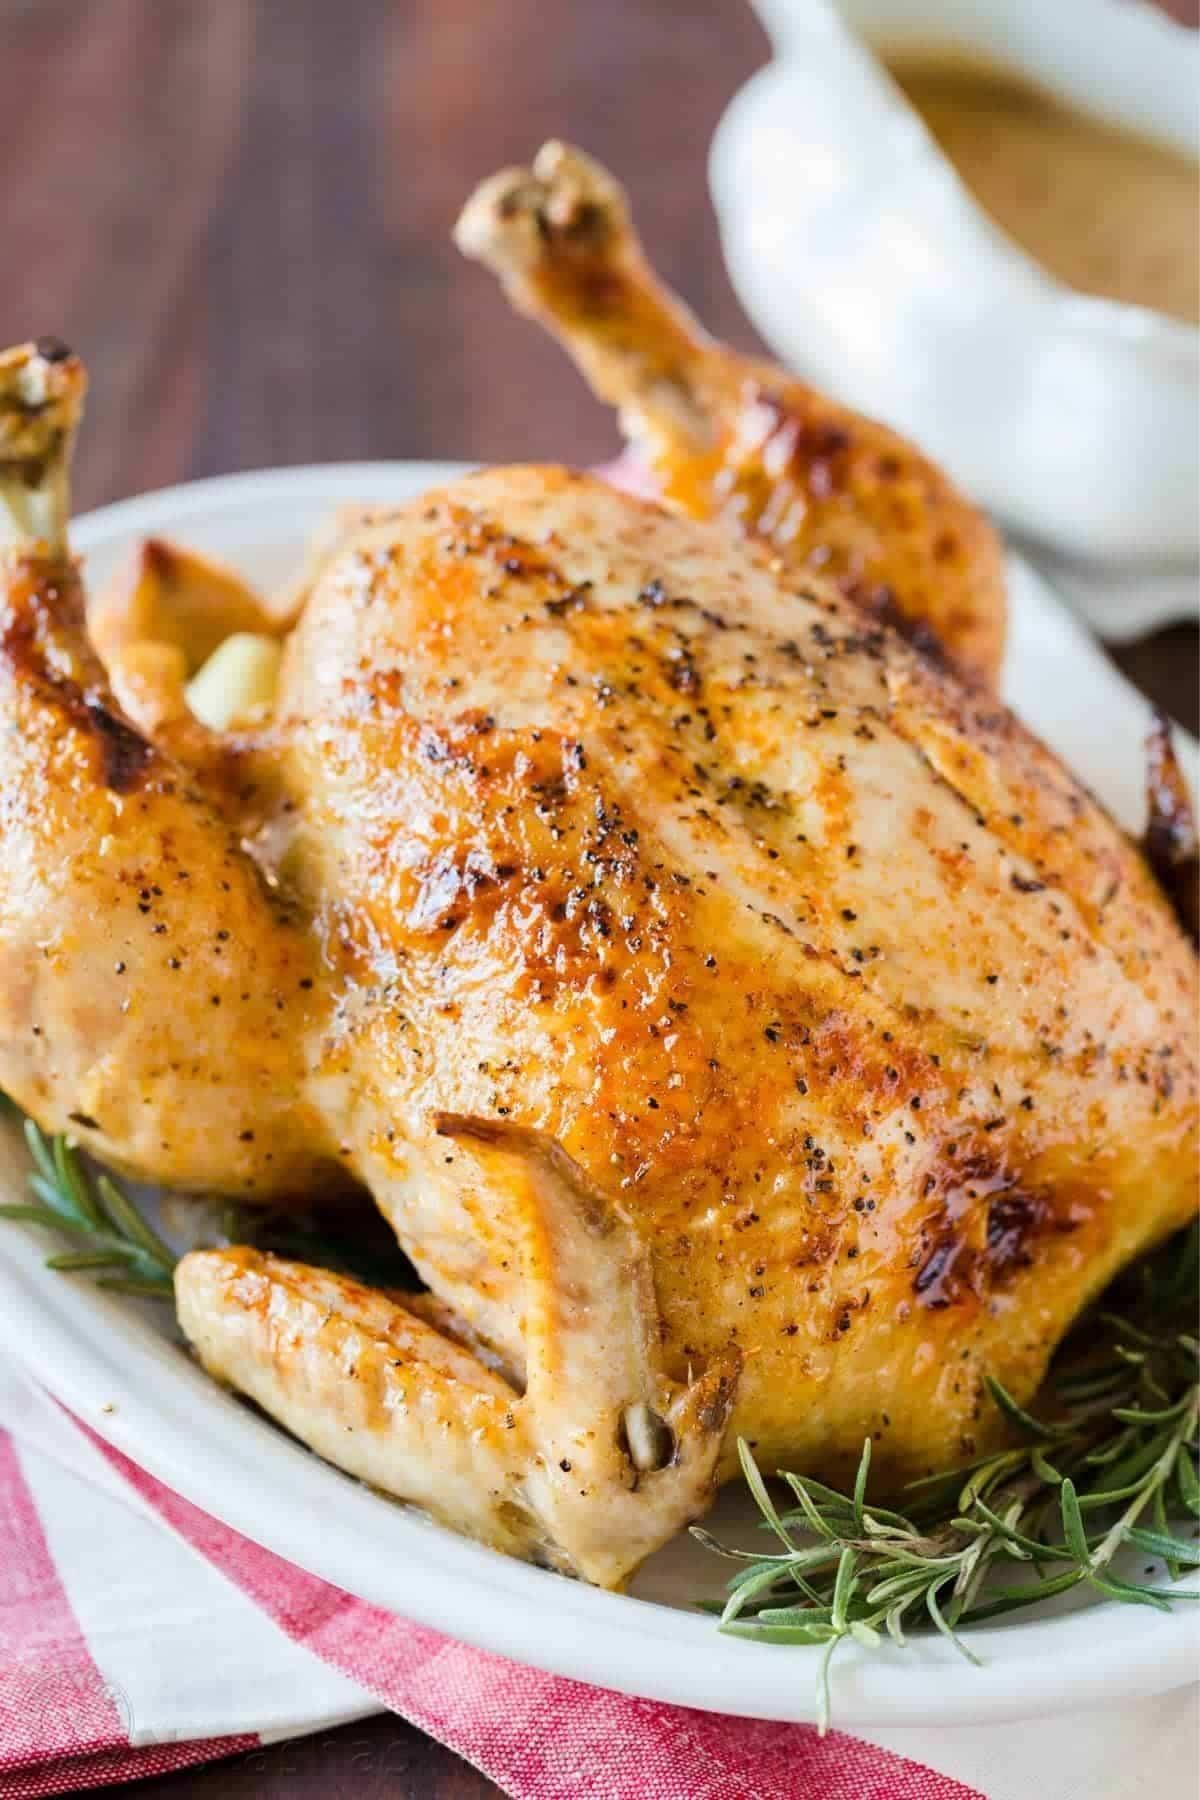 Whole chicken on white platter